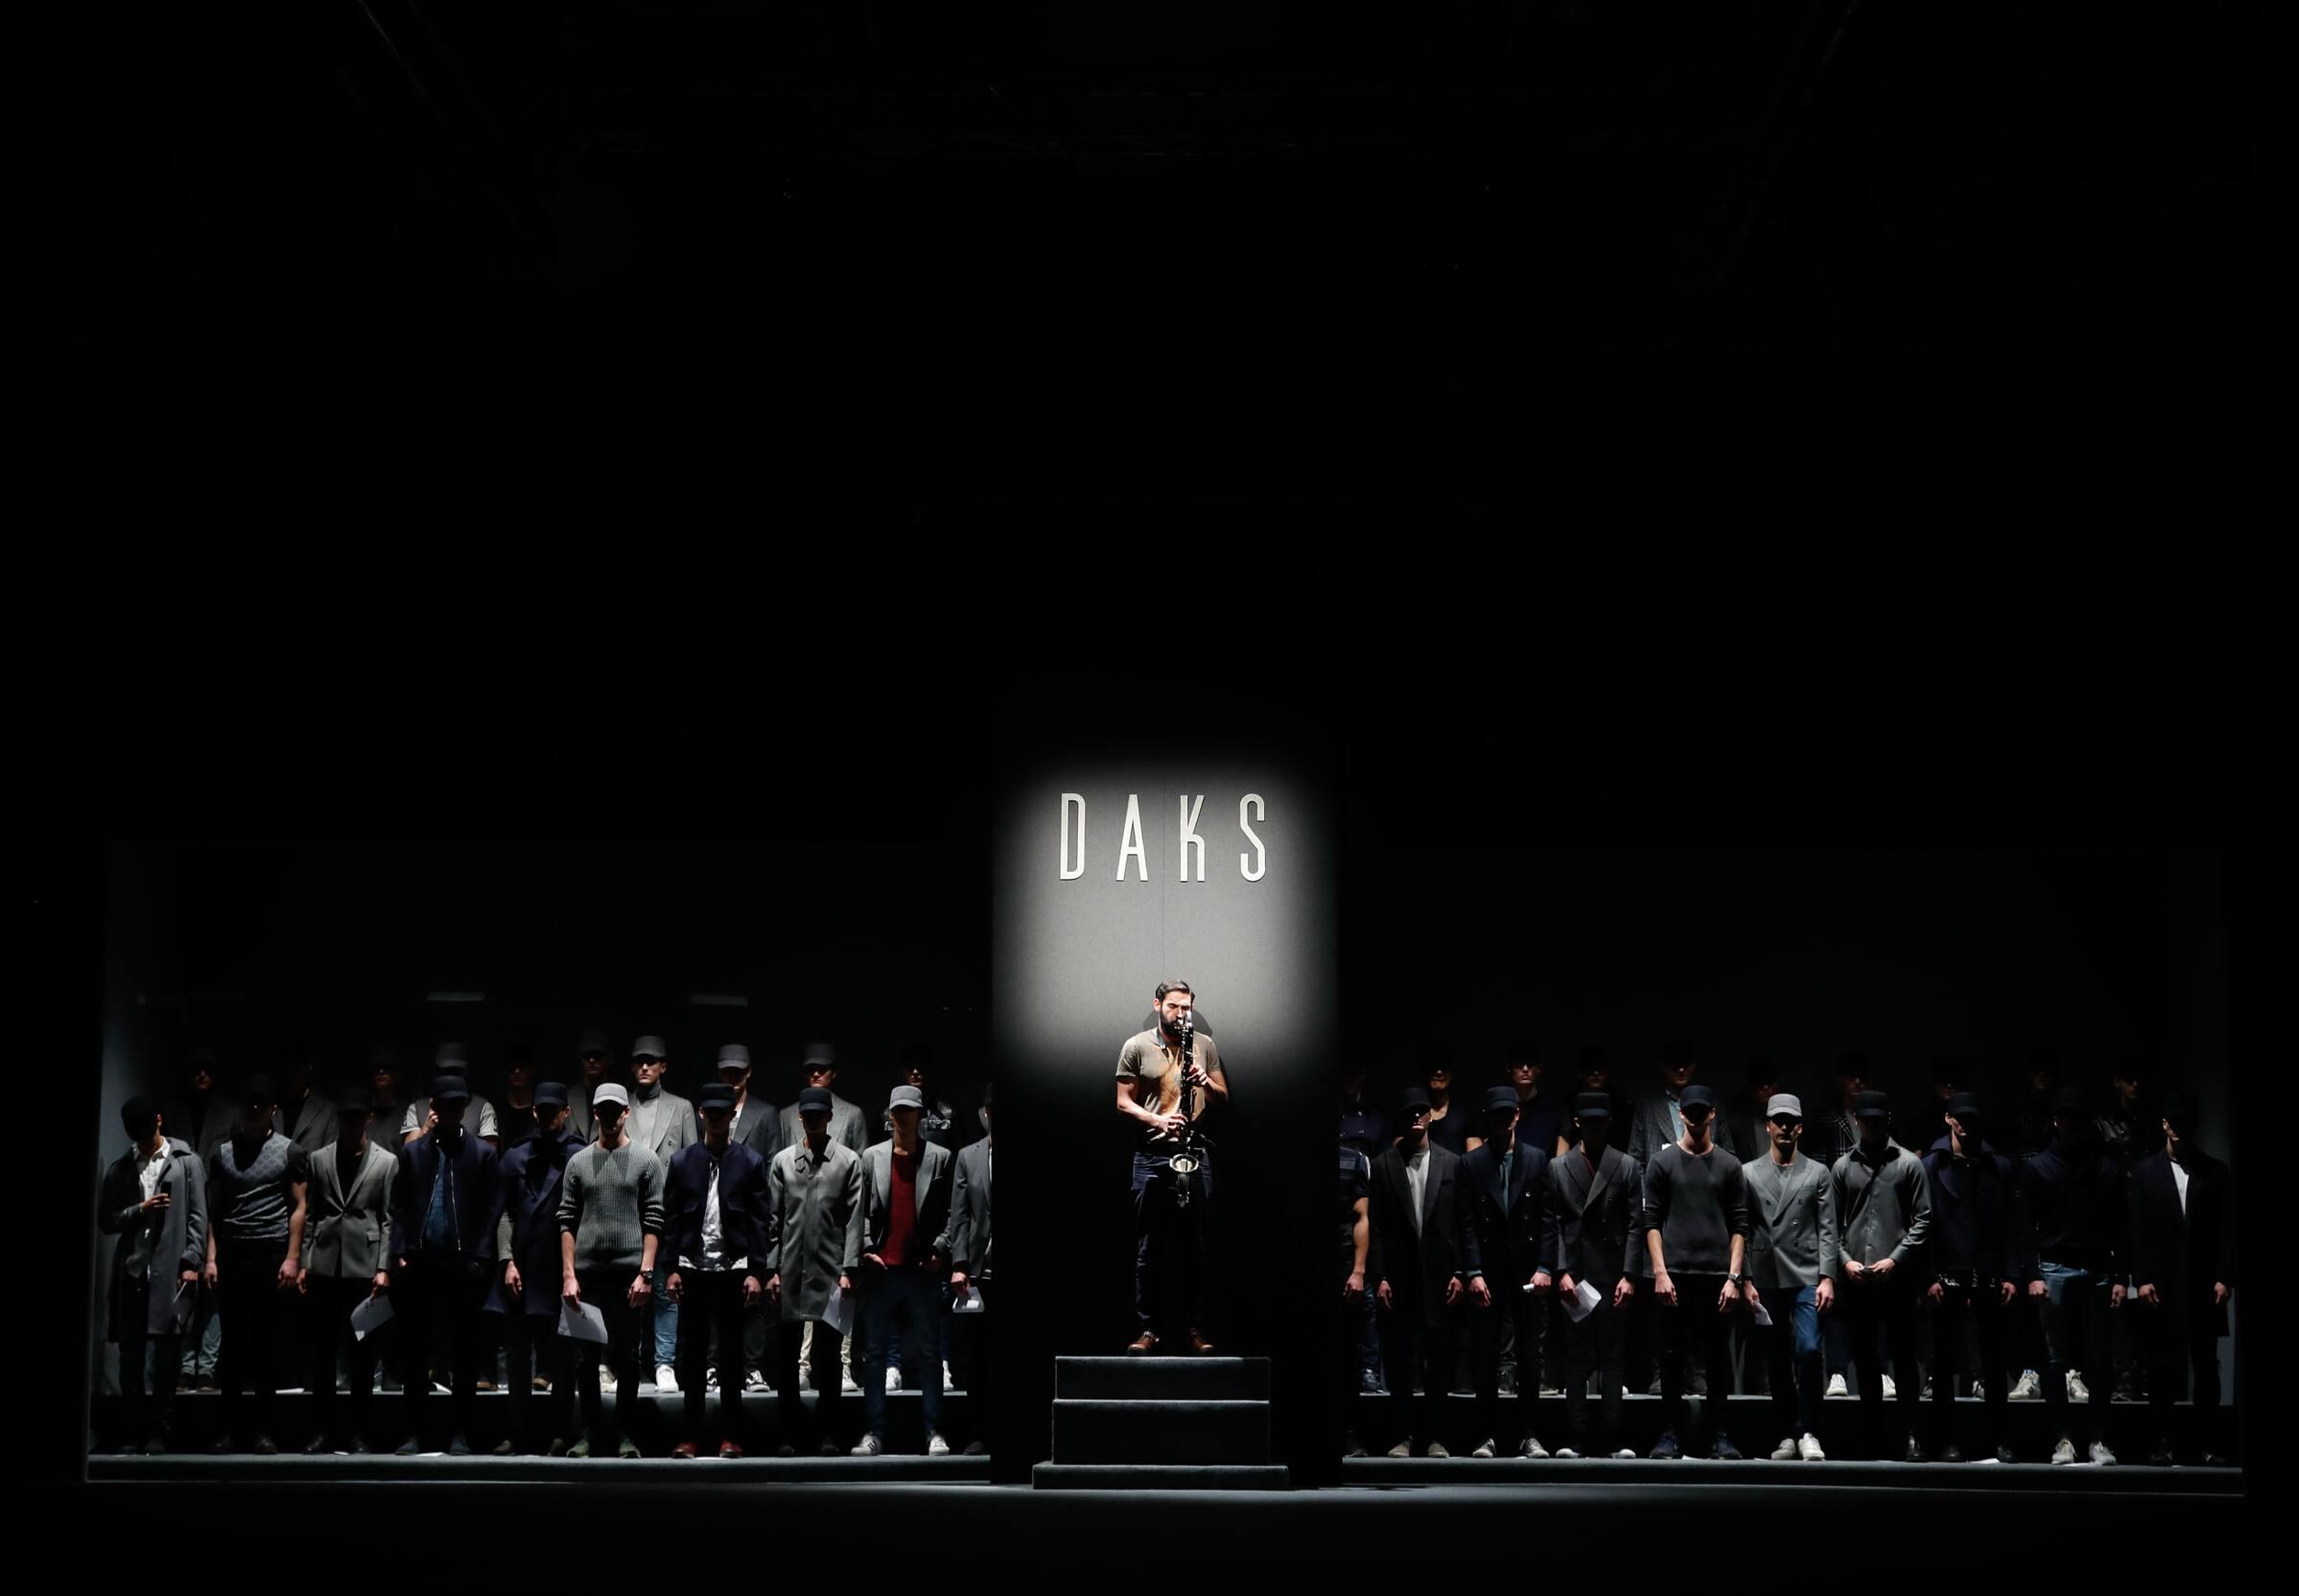 Backstage Daks Fall Winter 2017-18